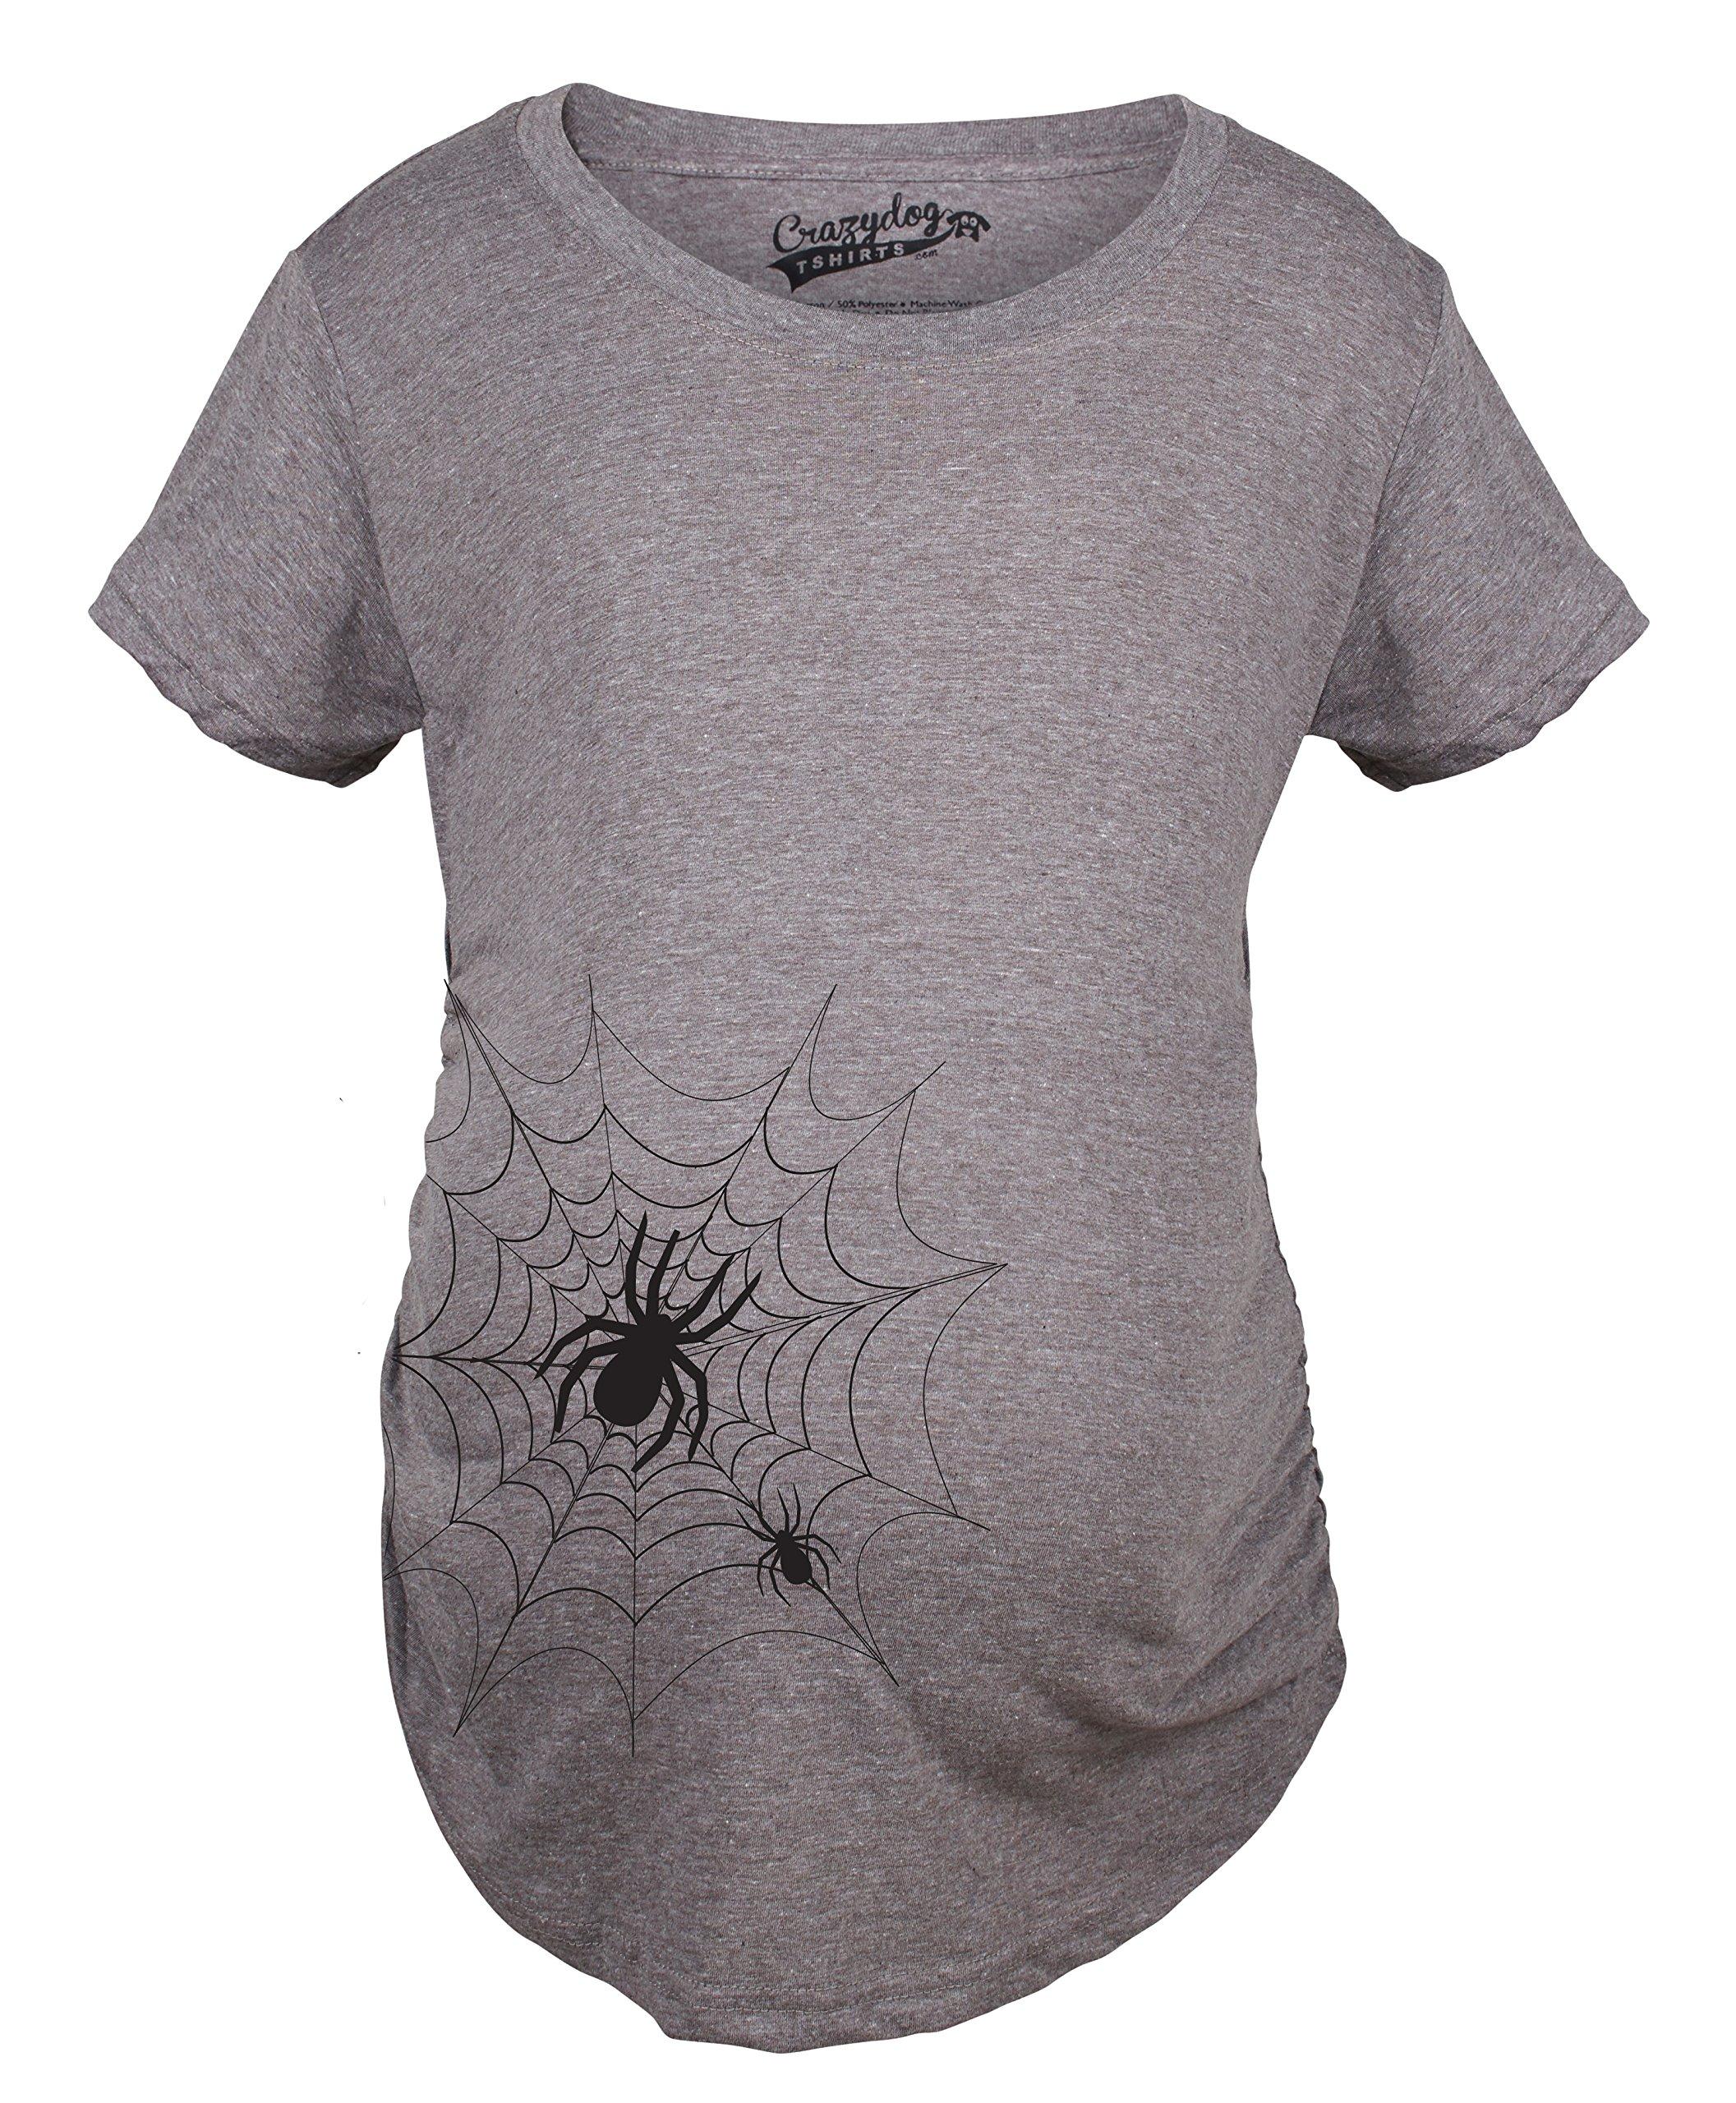 Maternity Spider Web Funny Halloween Announce Pregnancy Tee Baby Bump T Shirt (Dark Grey) -XL